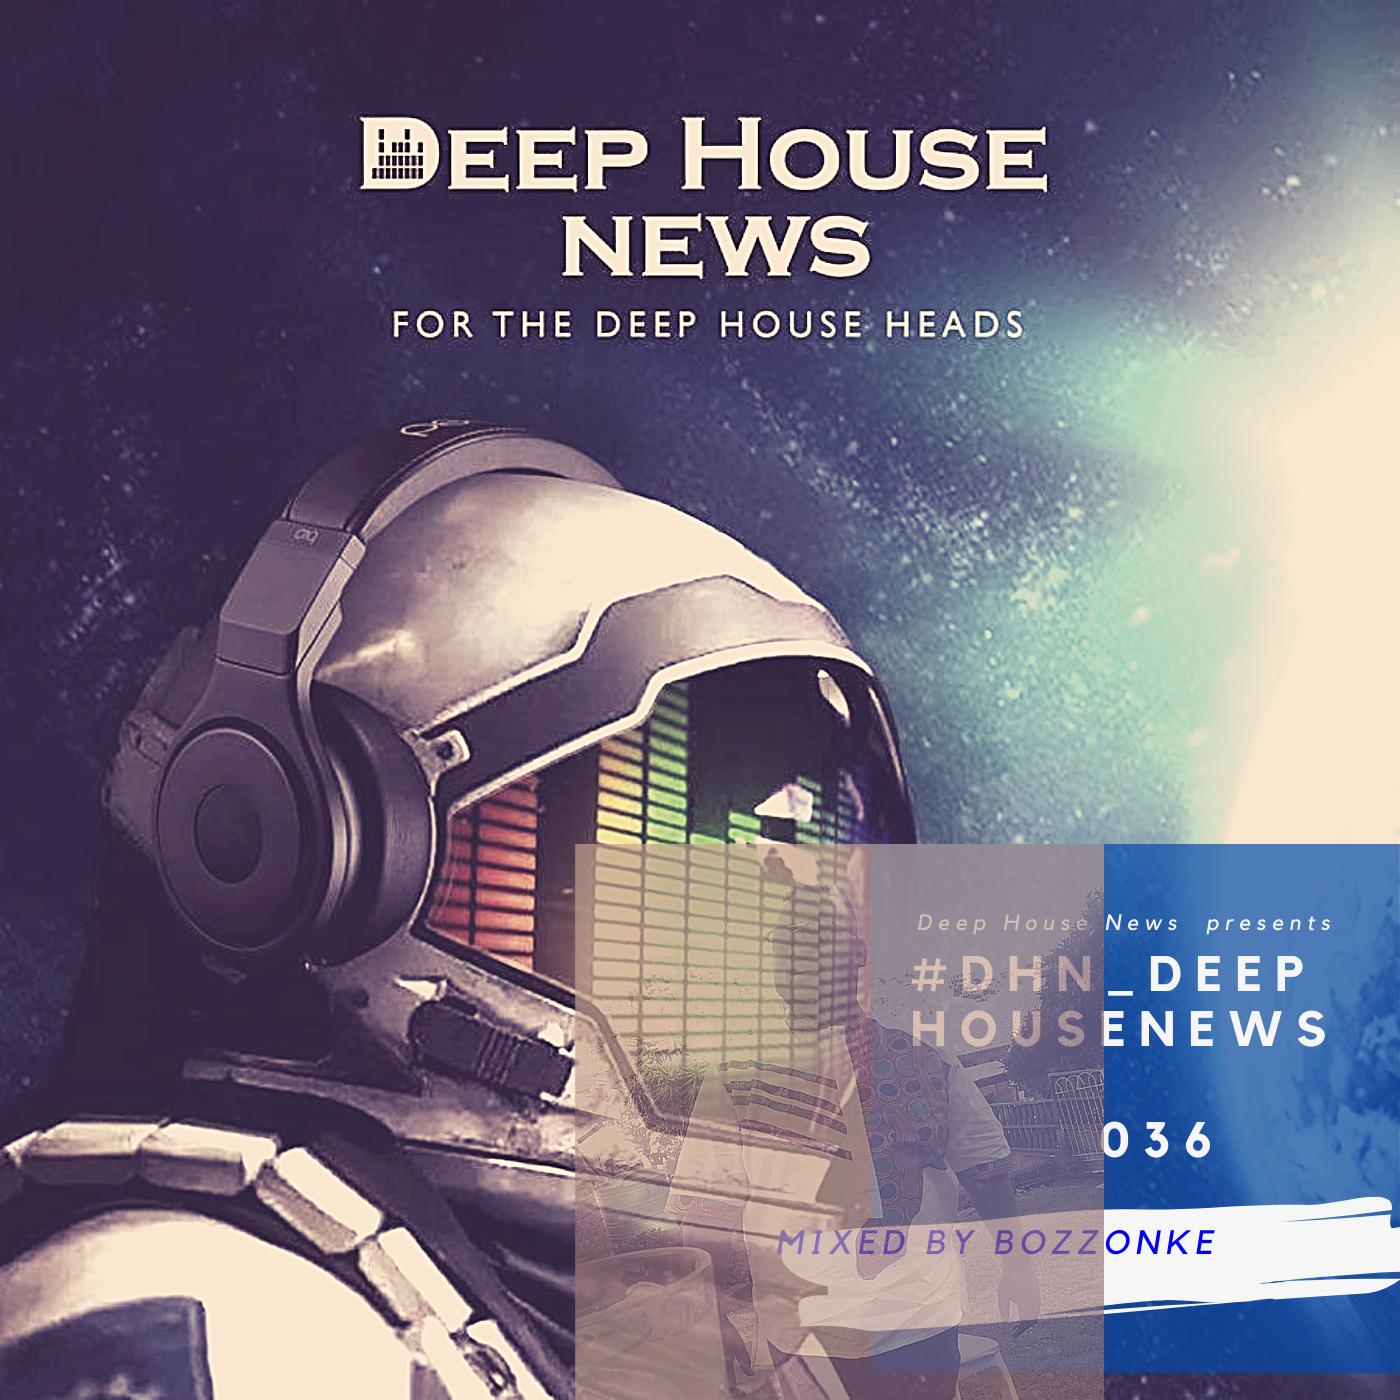 #DHN_DeepHouseNews 036 (Mixed By BozzOnke)